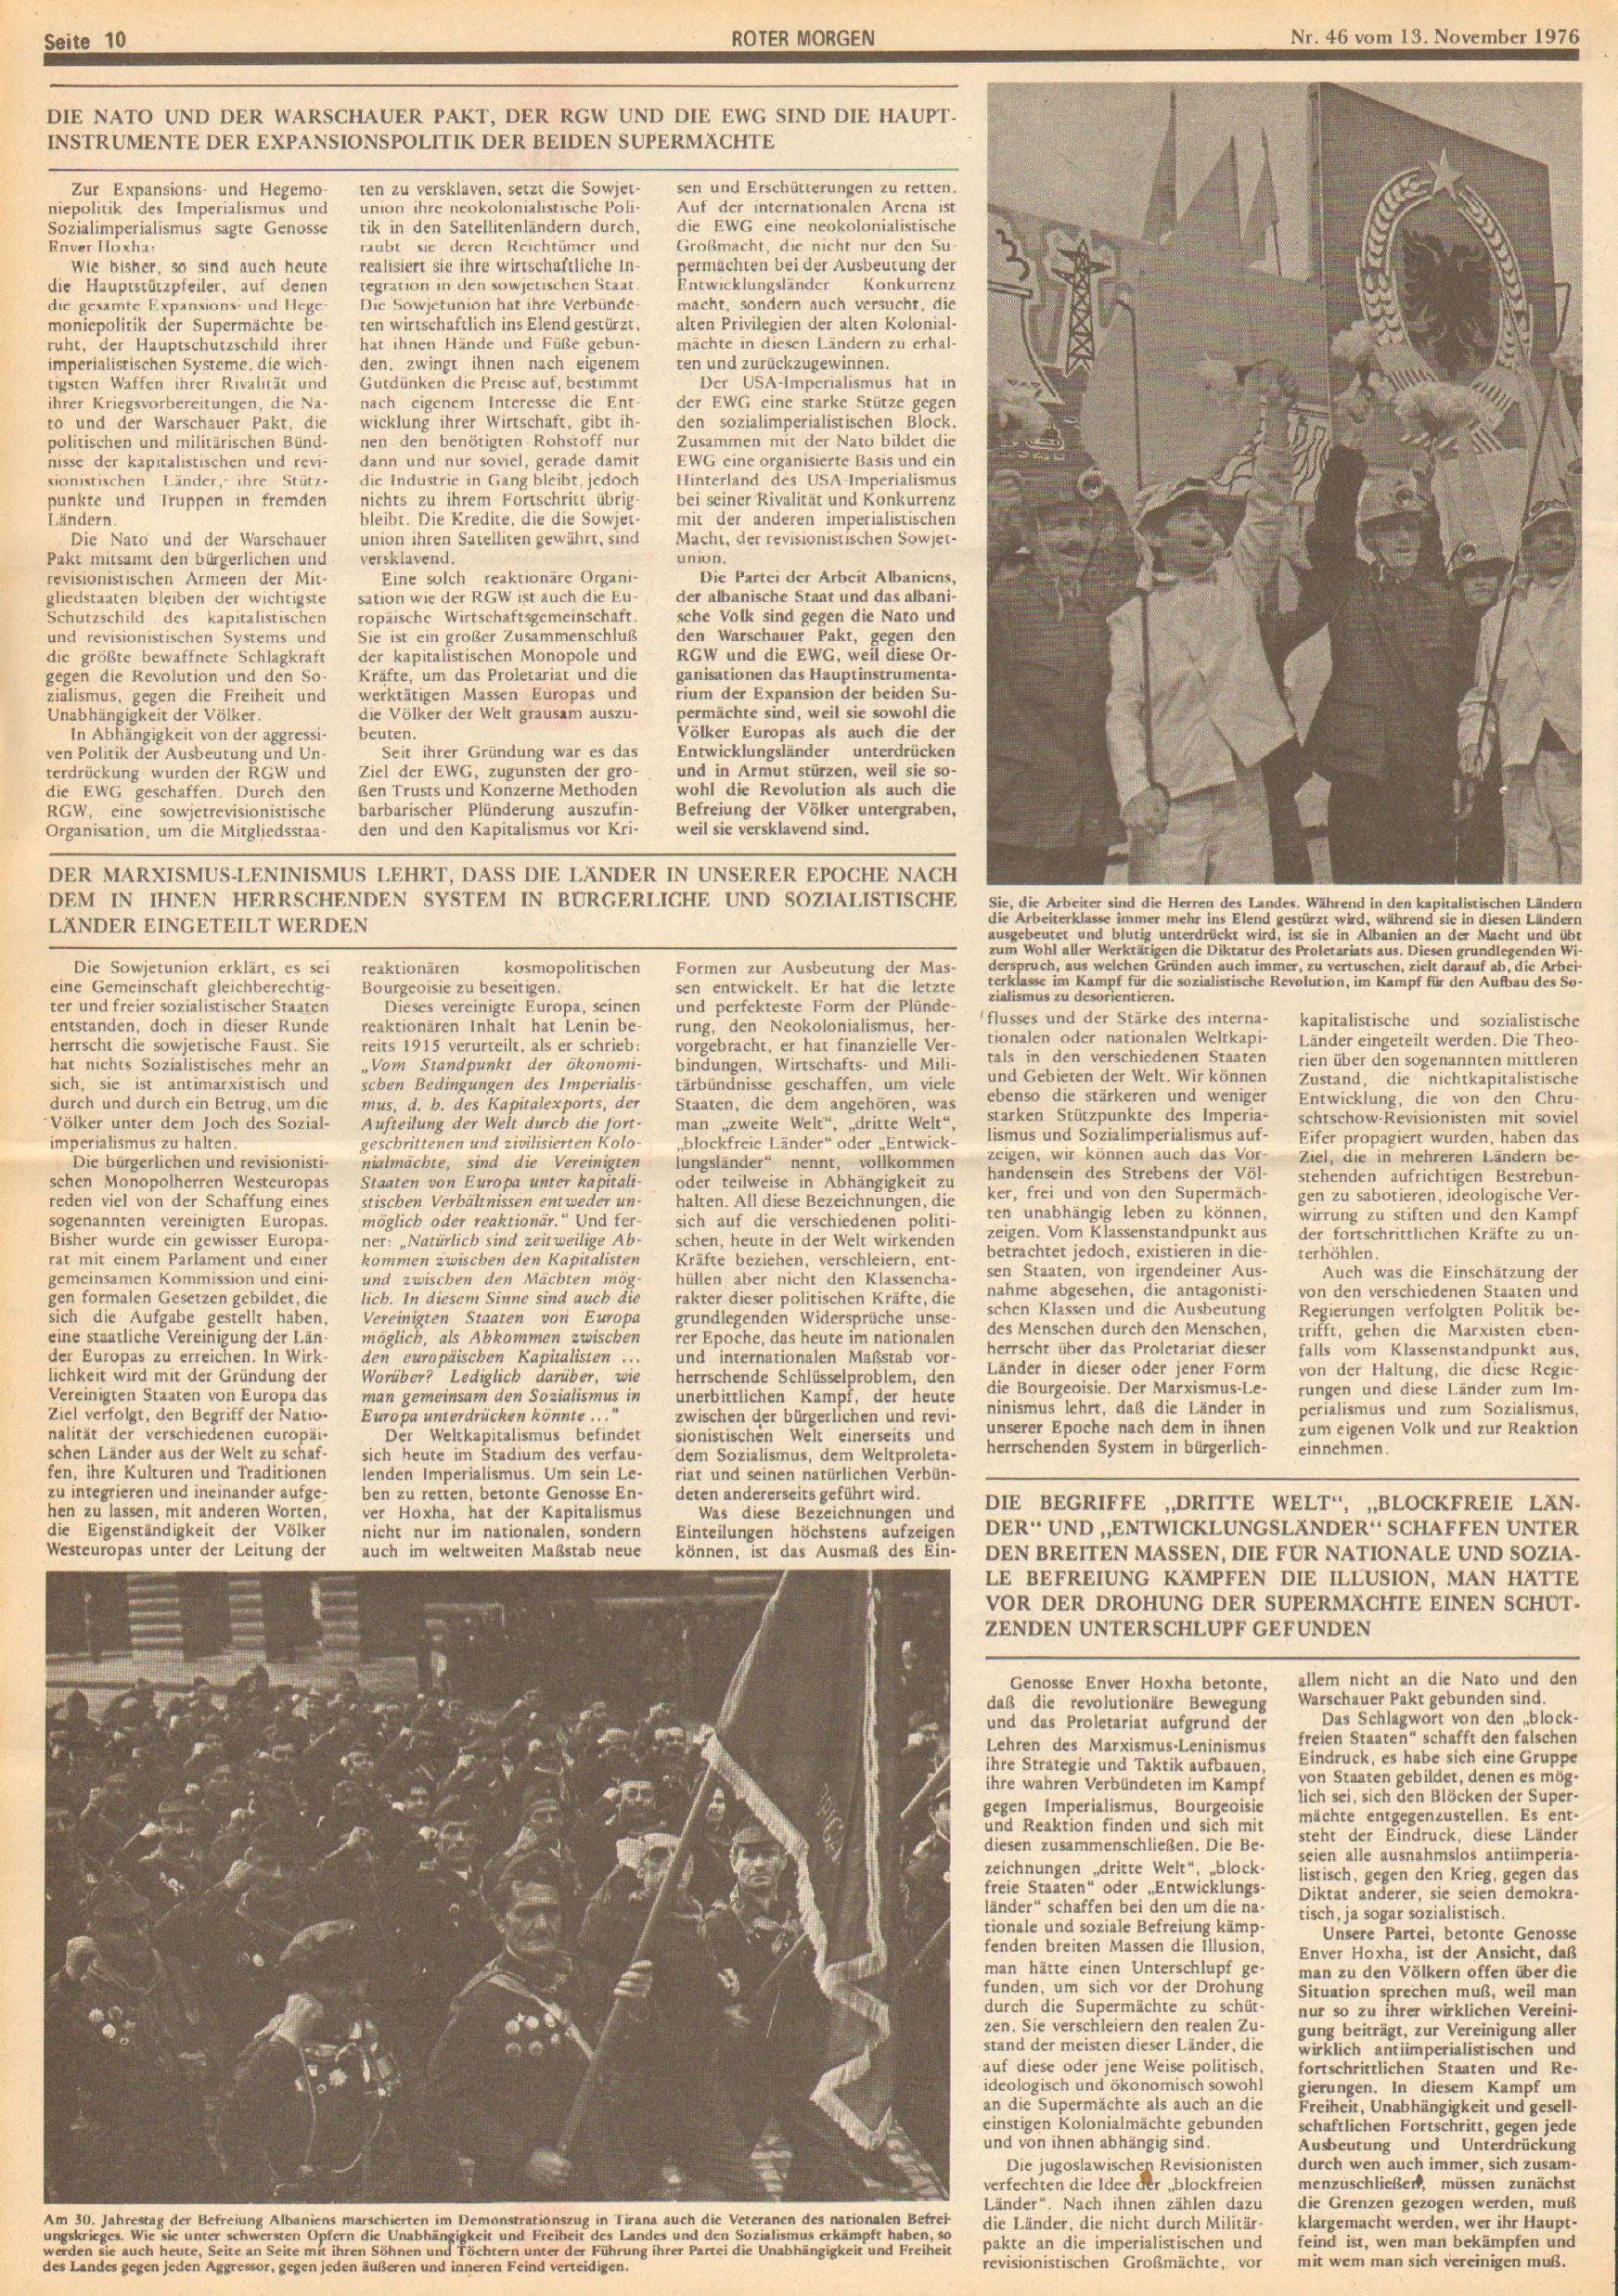 Roter Morgen, 10. Jg., 13. November 1976, Nr. 46, Seite 10